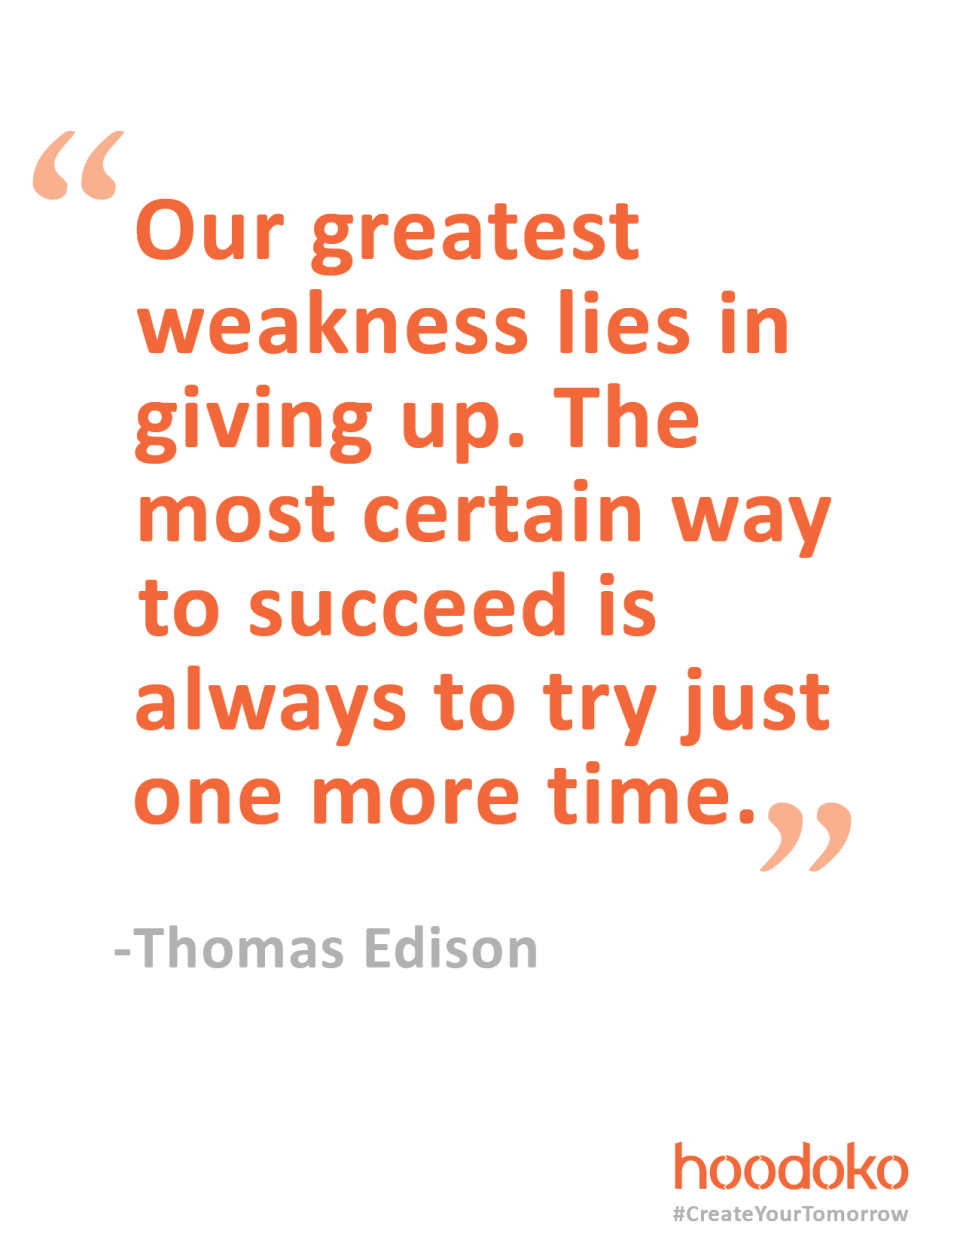 Midweek Motivation from Thomas Edison